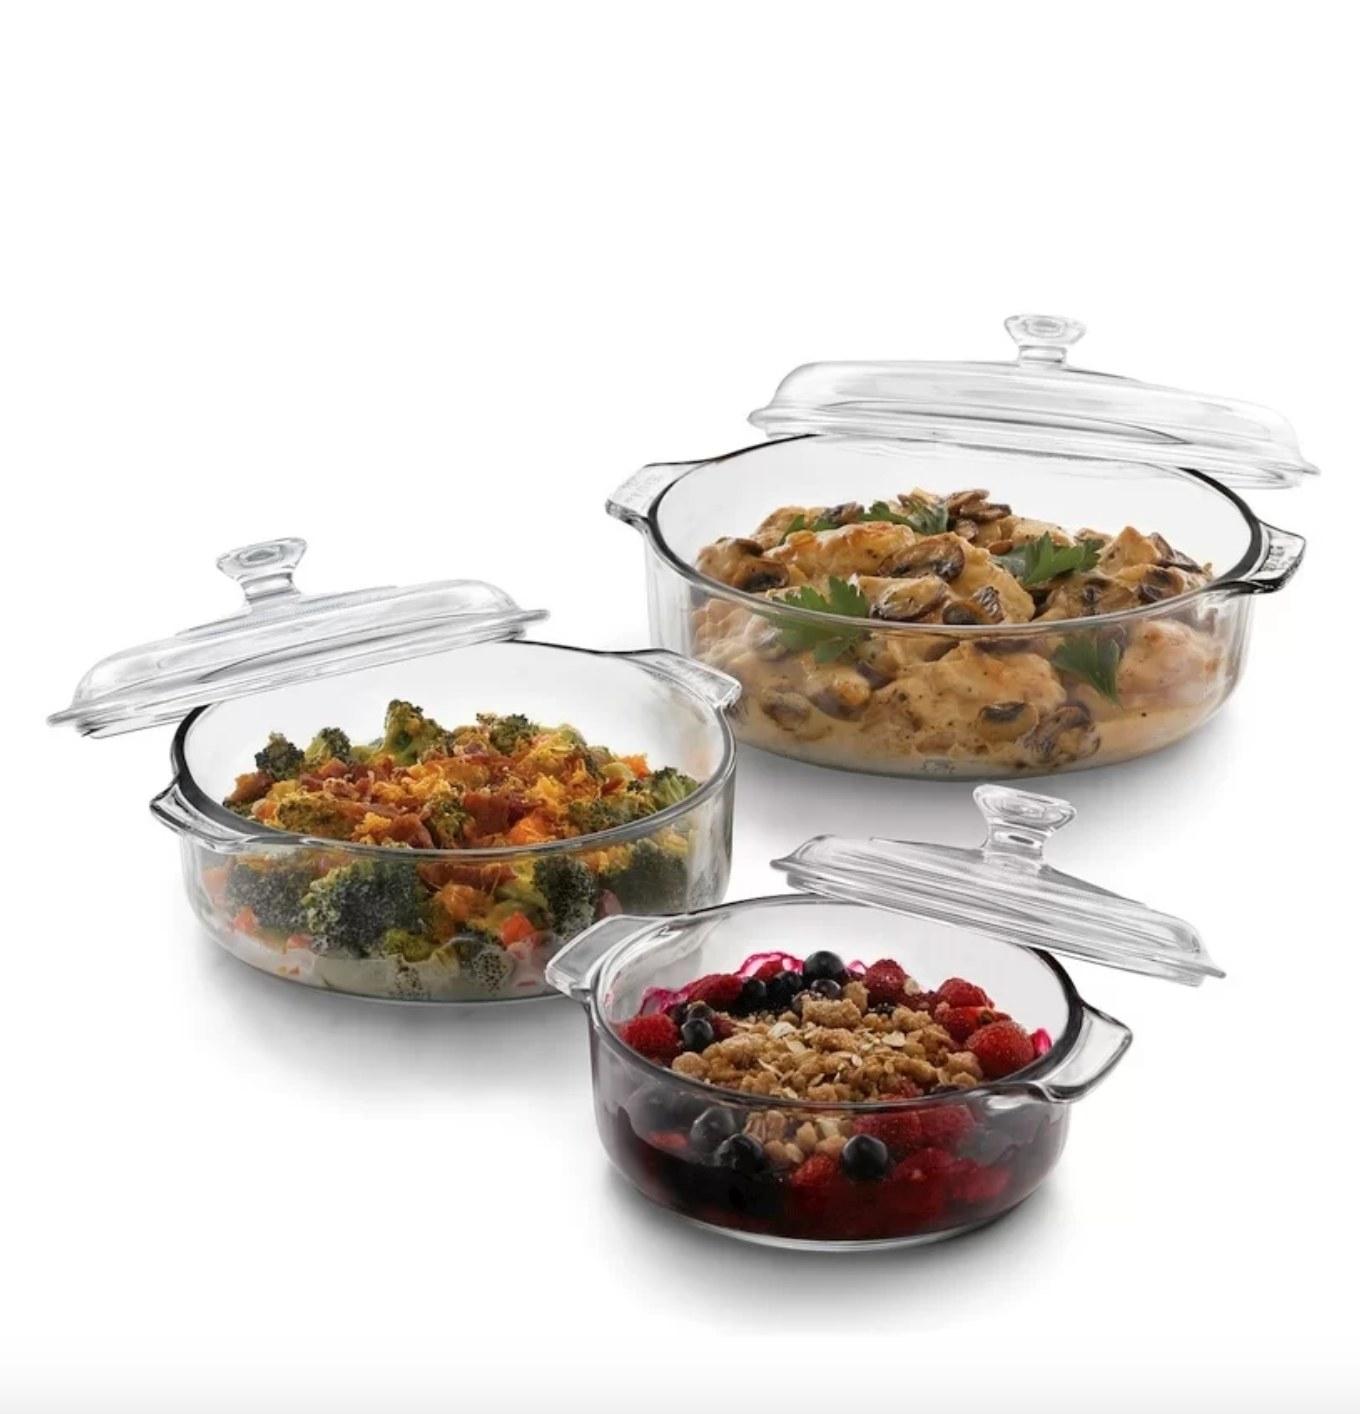 The casserole set in glass